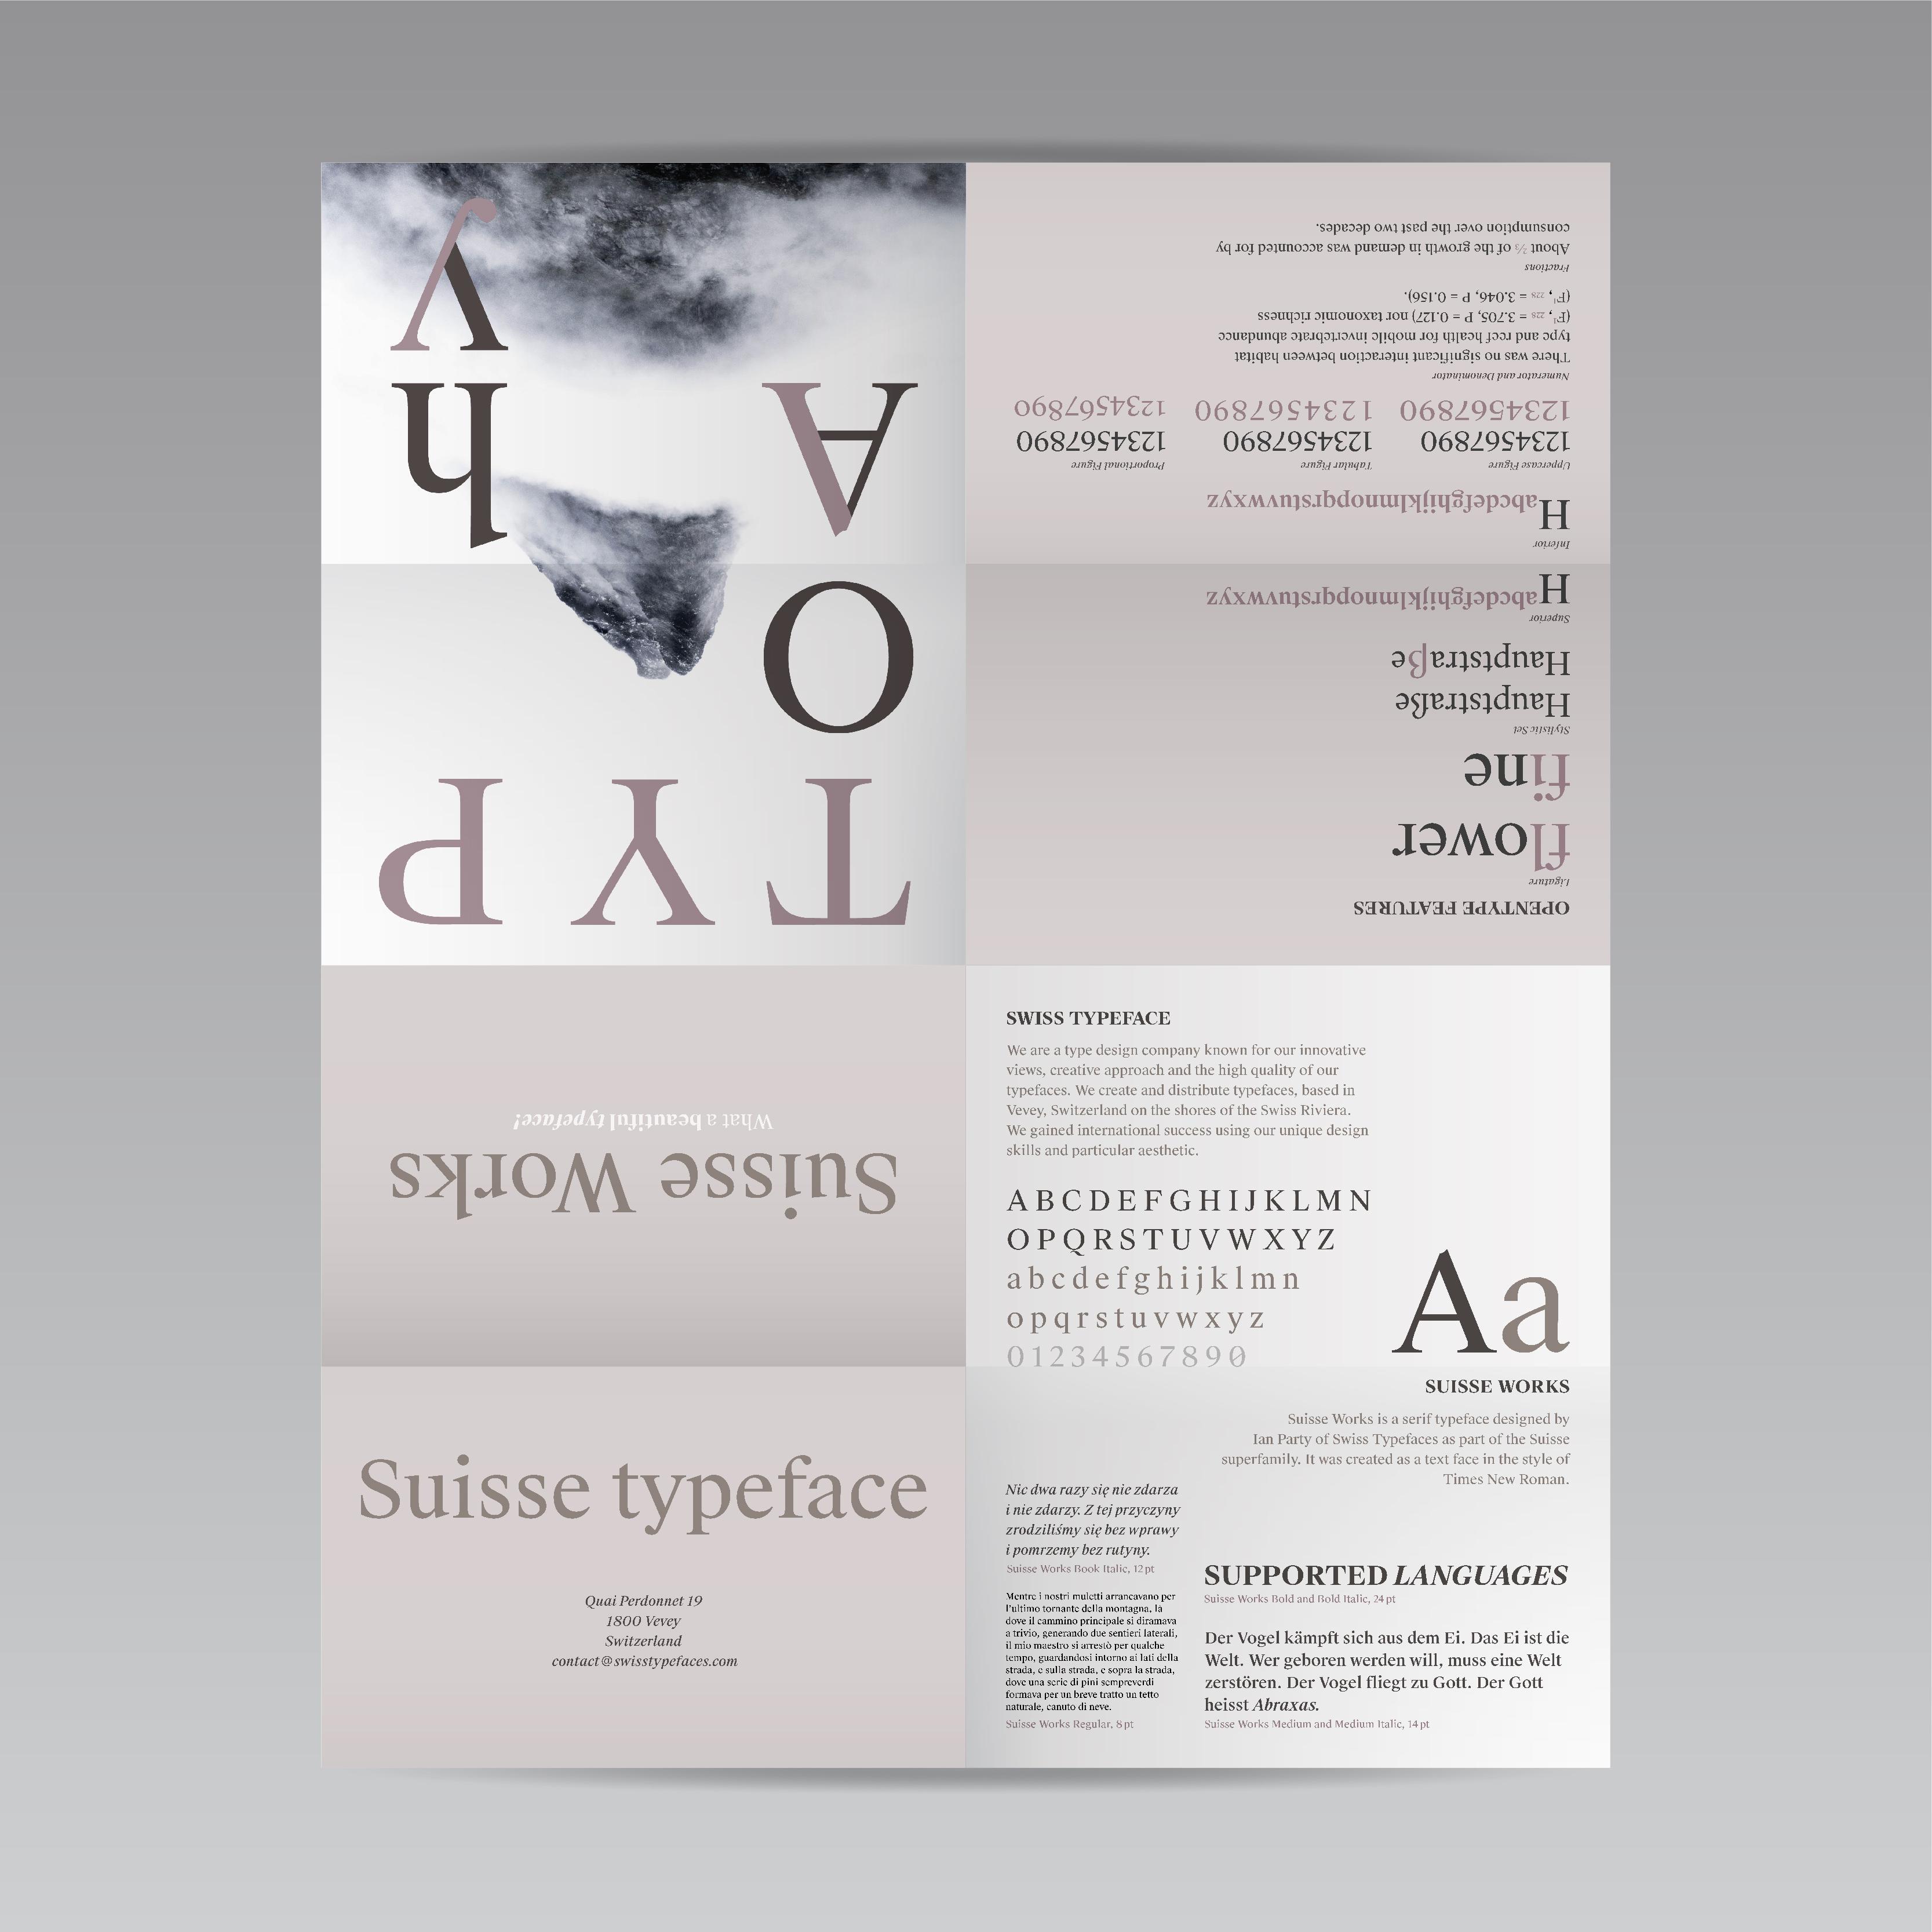 Folding_Type_specimen_Mock_up